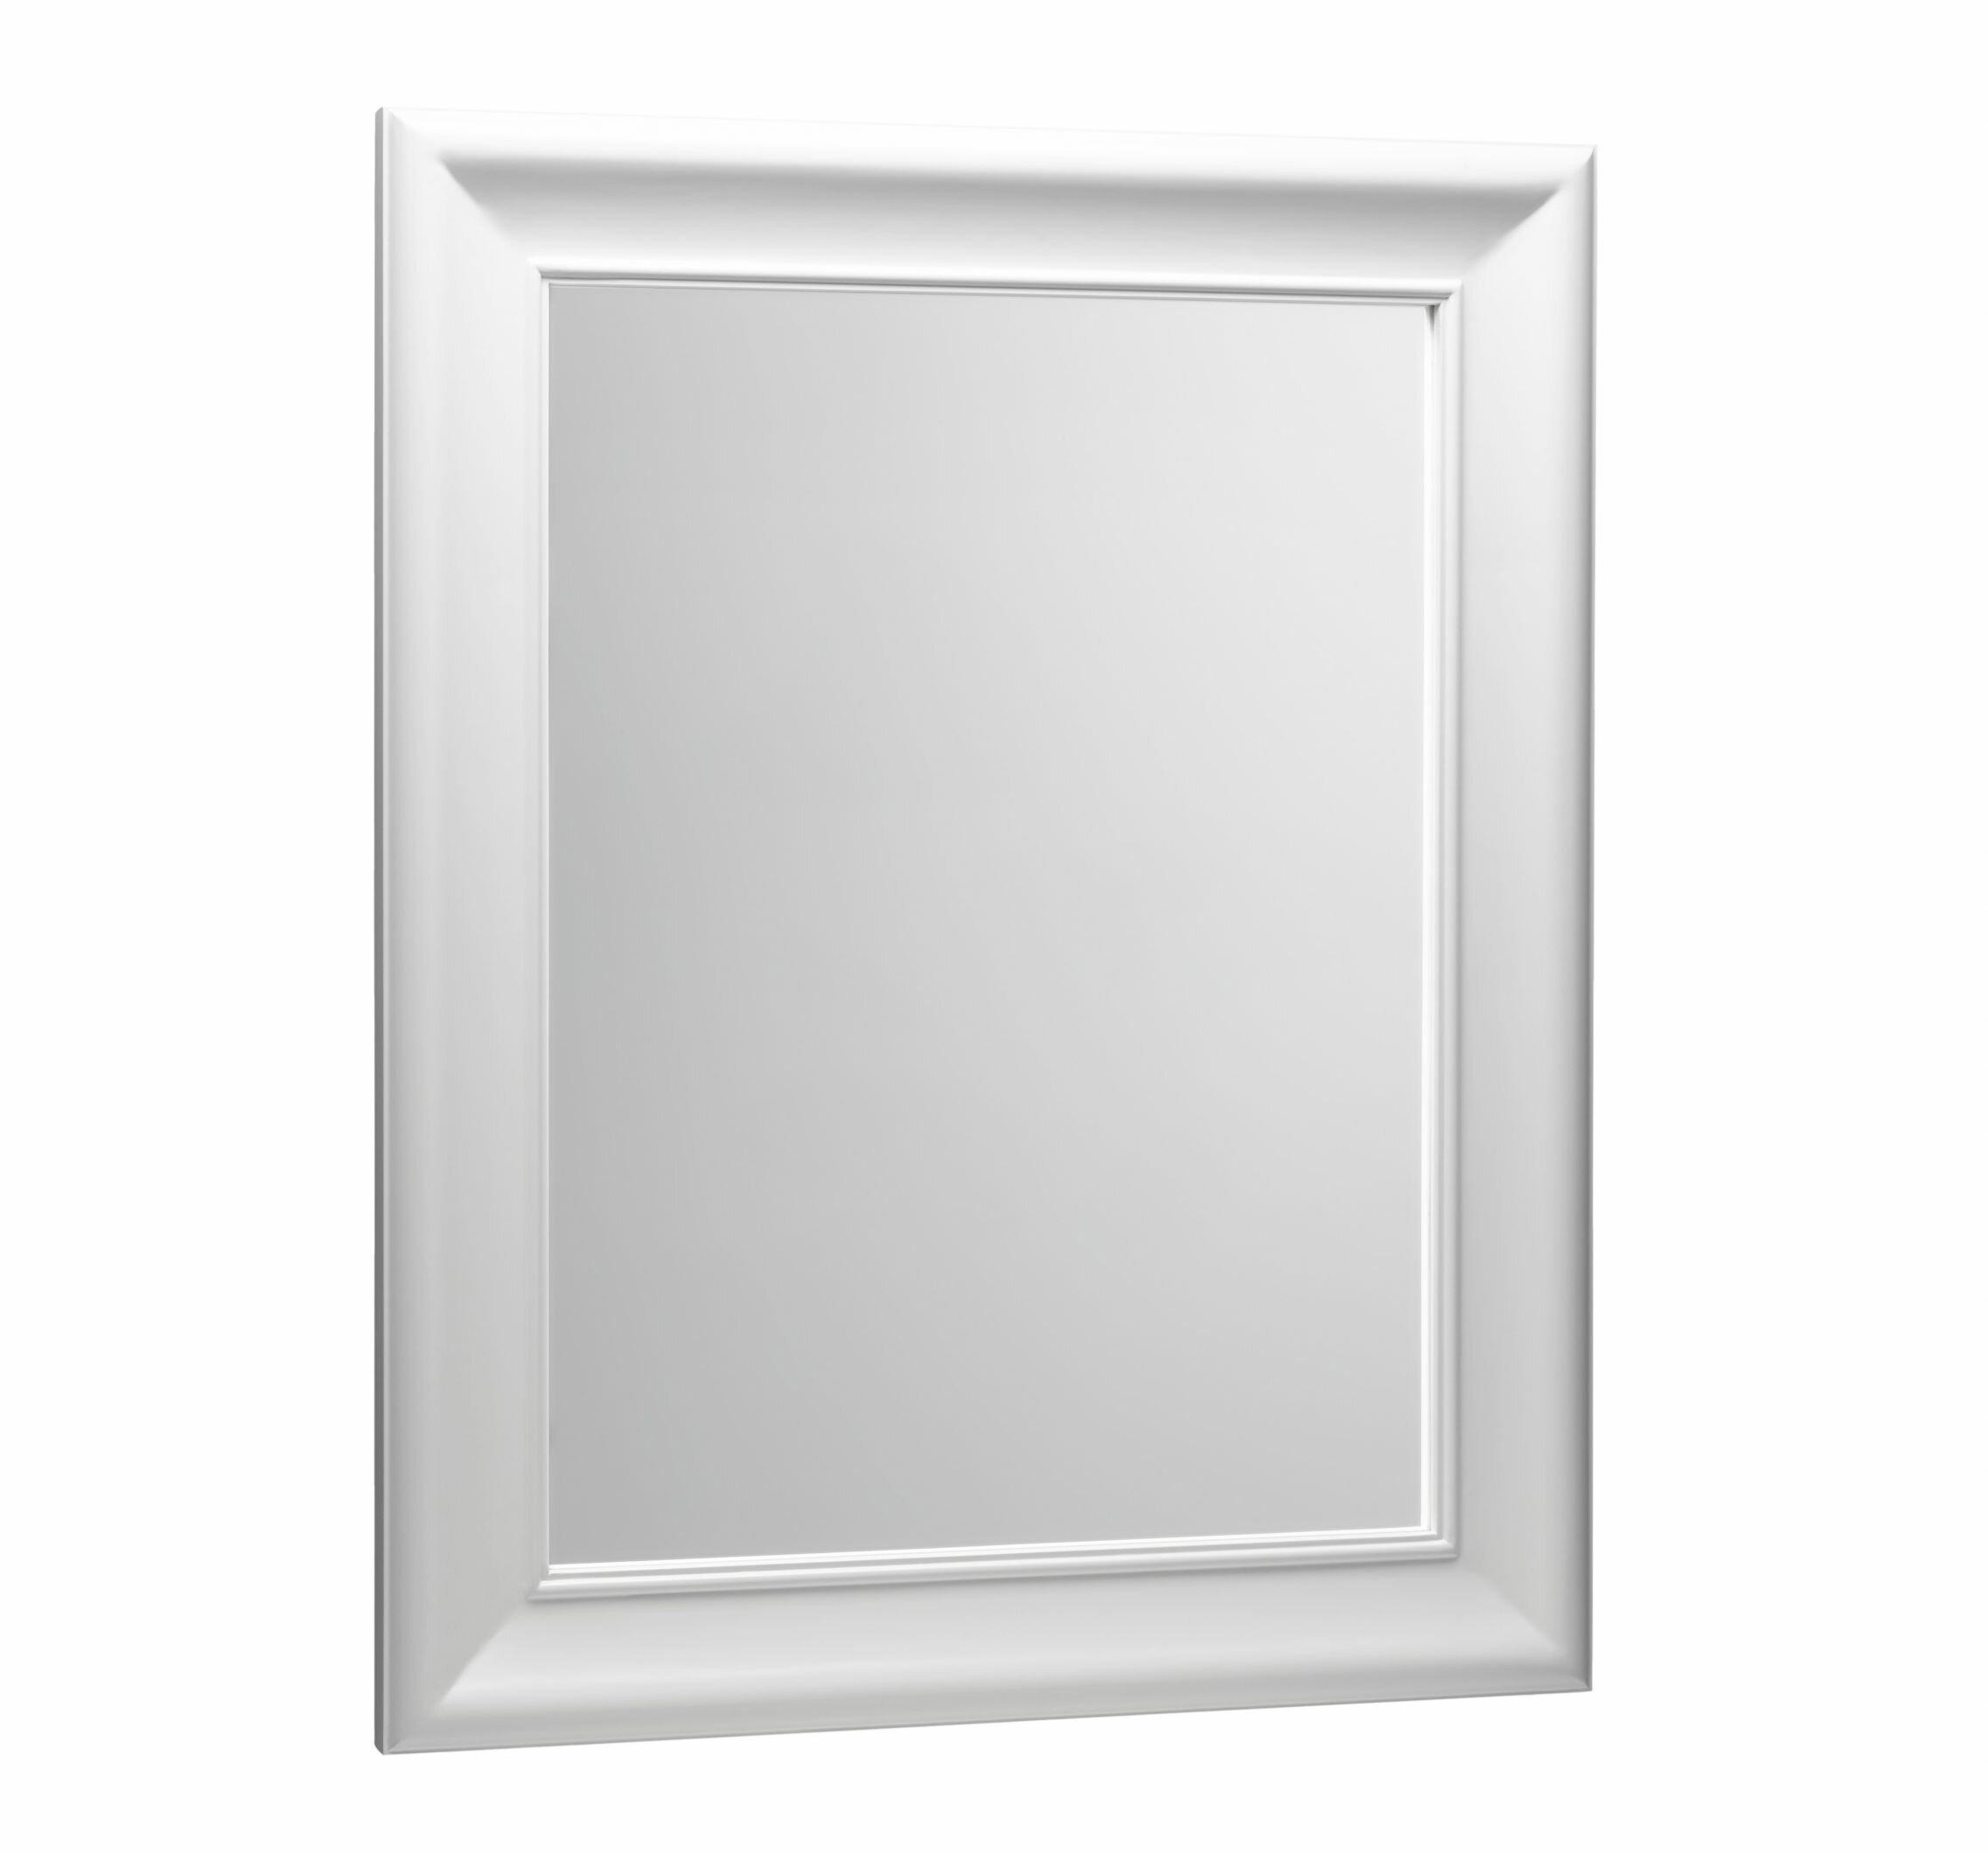 Ronbow Traditional 29 X 37 Solid Wood Framed Bathroom Mirror In Cream Perigold